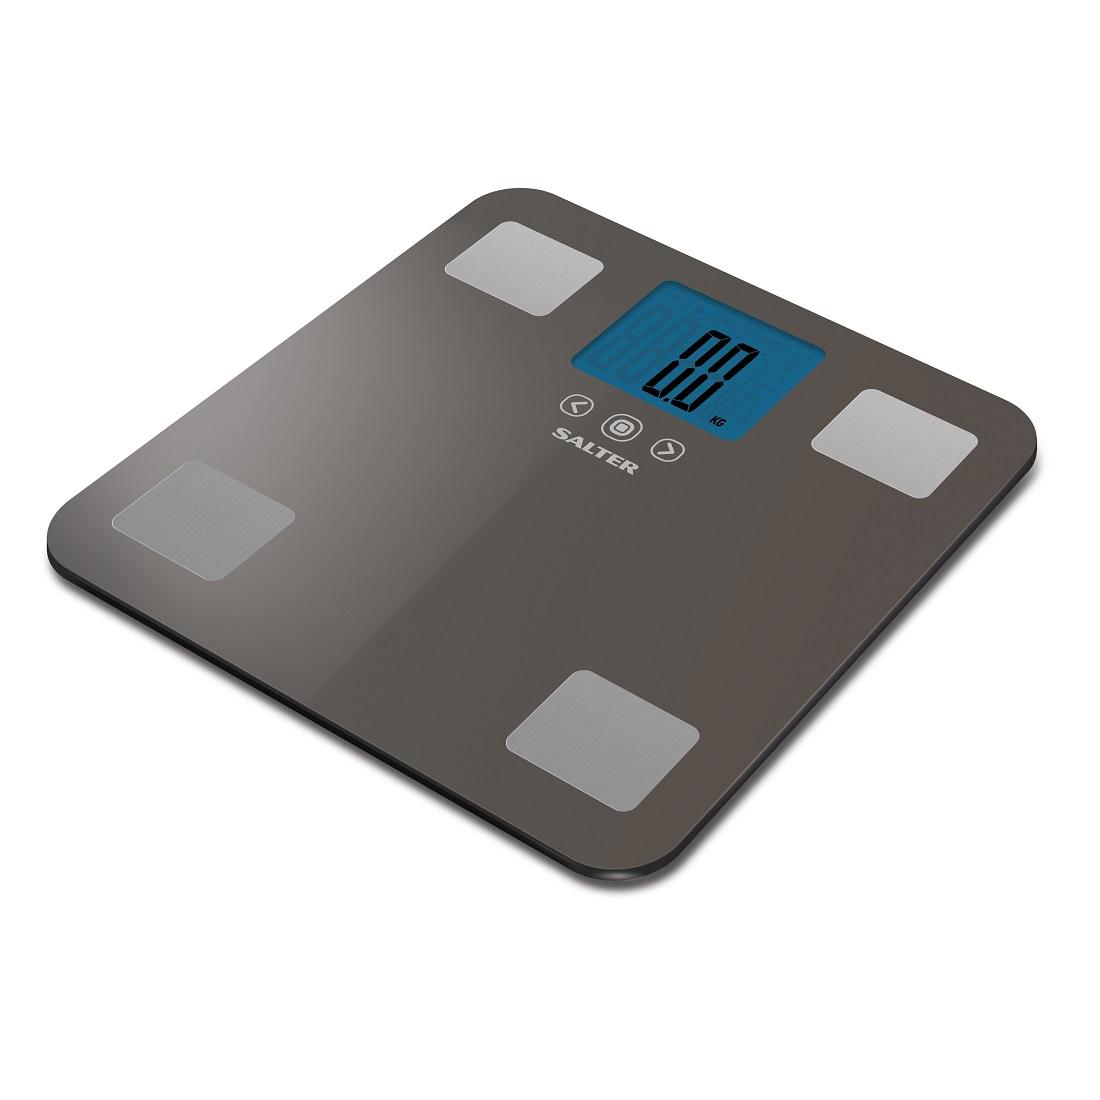 Salter 250kg Max Analyser Electronic Digital Bathroom Scales Silver 9179 SV3R